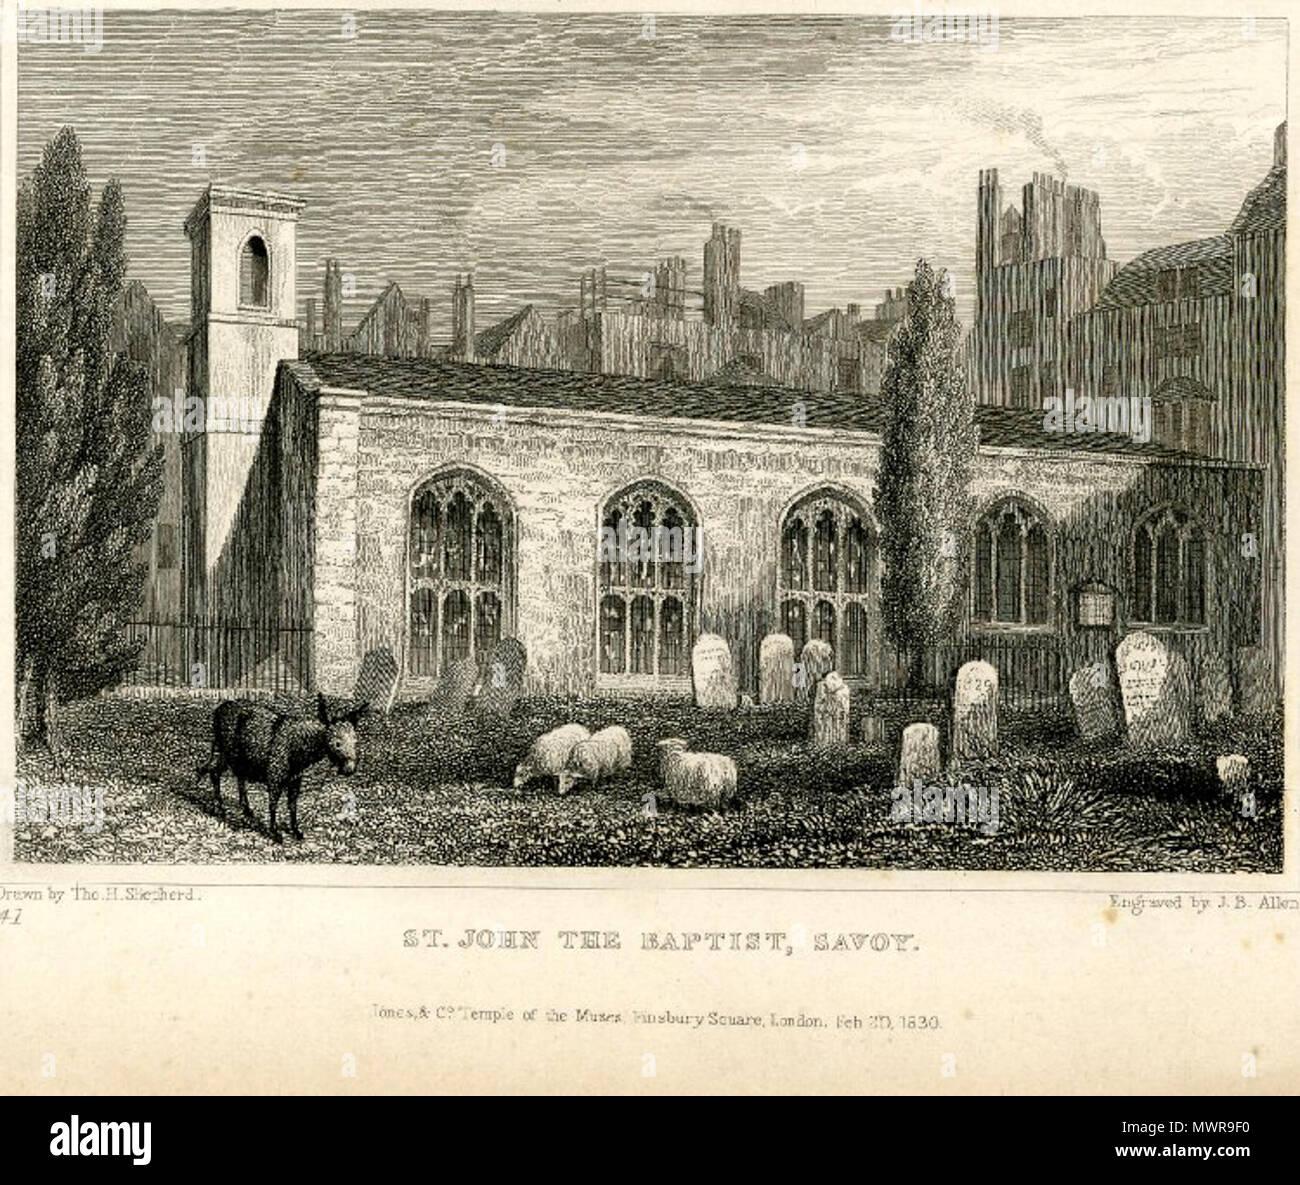 . Engraving of the Savoy Chapel with a donkey and three sheep . 1830. Thomas Hosmer Shepherd 545 Savoy Chapel Thomas Hosmer Shepherd 1830 Stock Photo